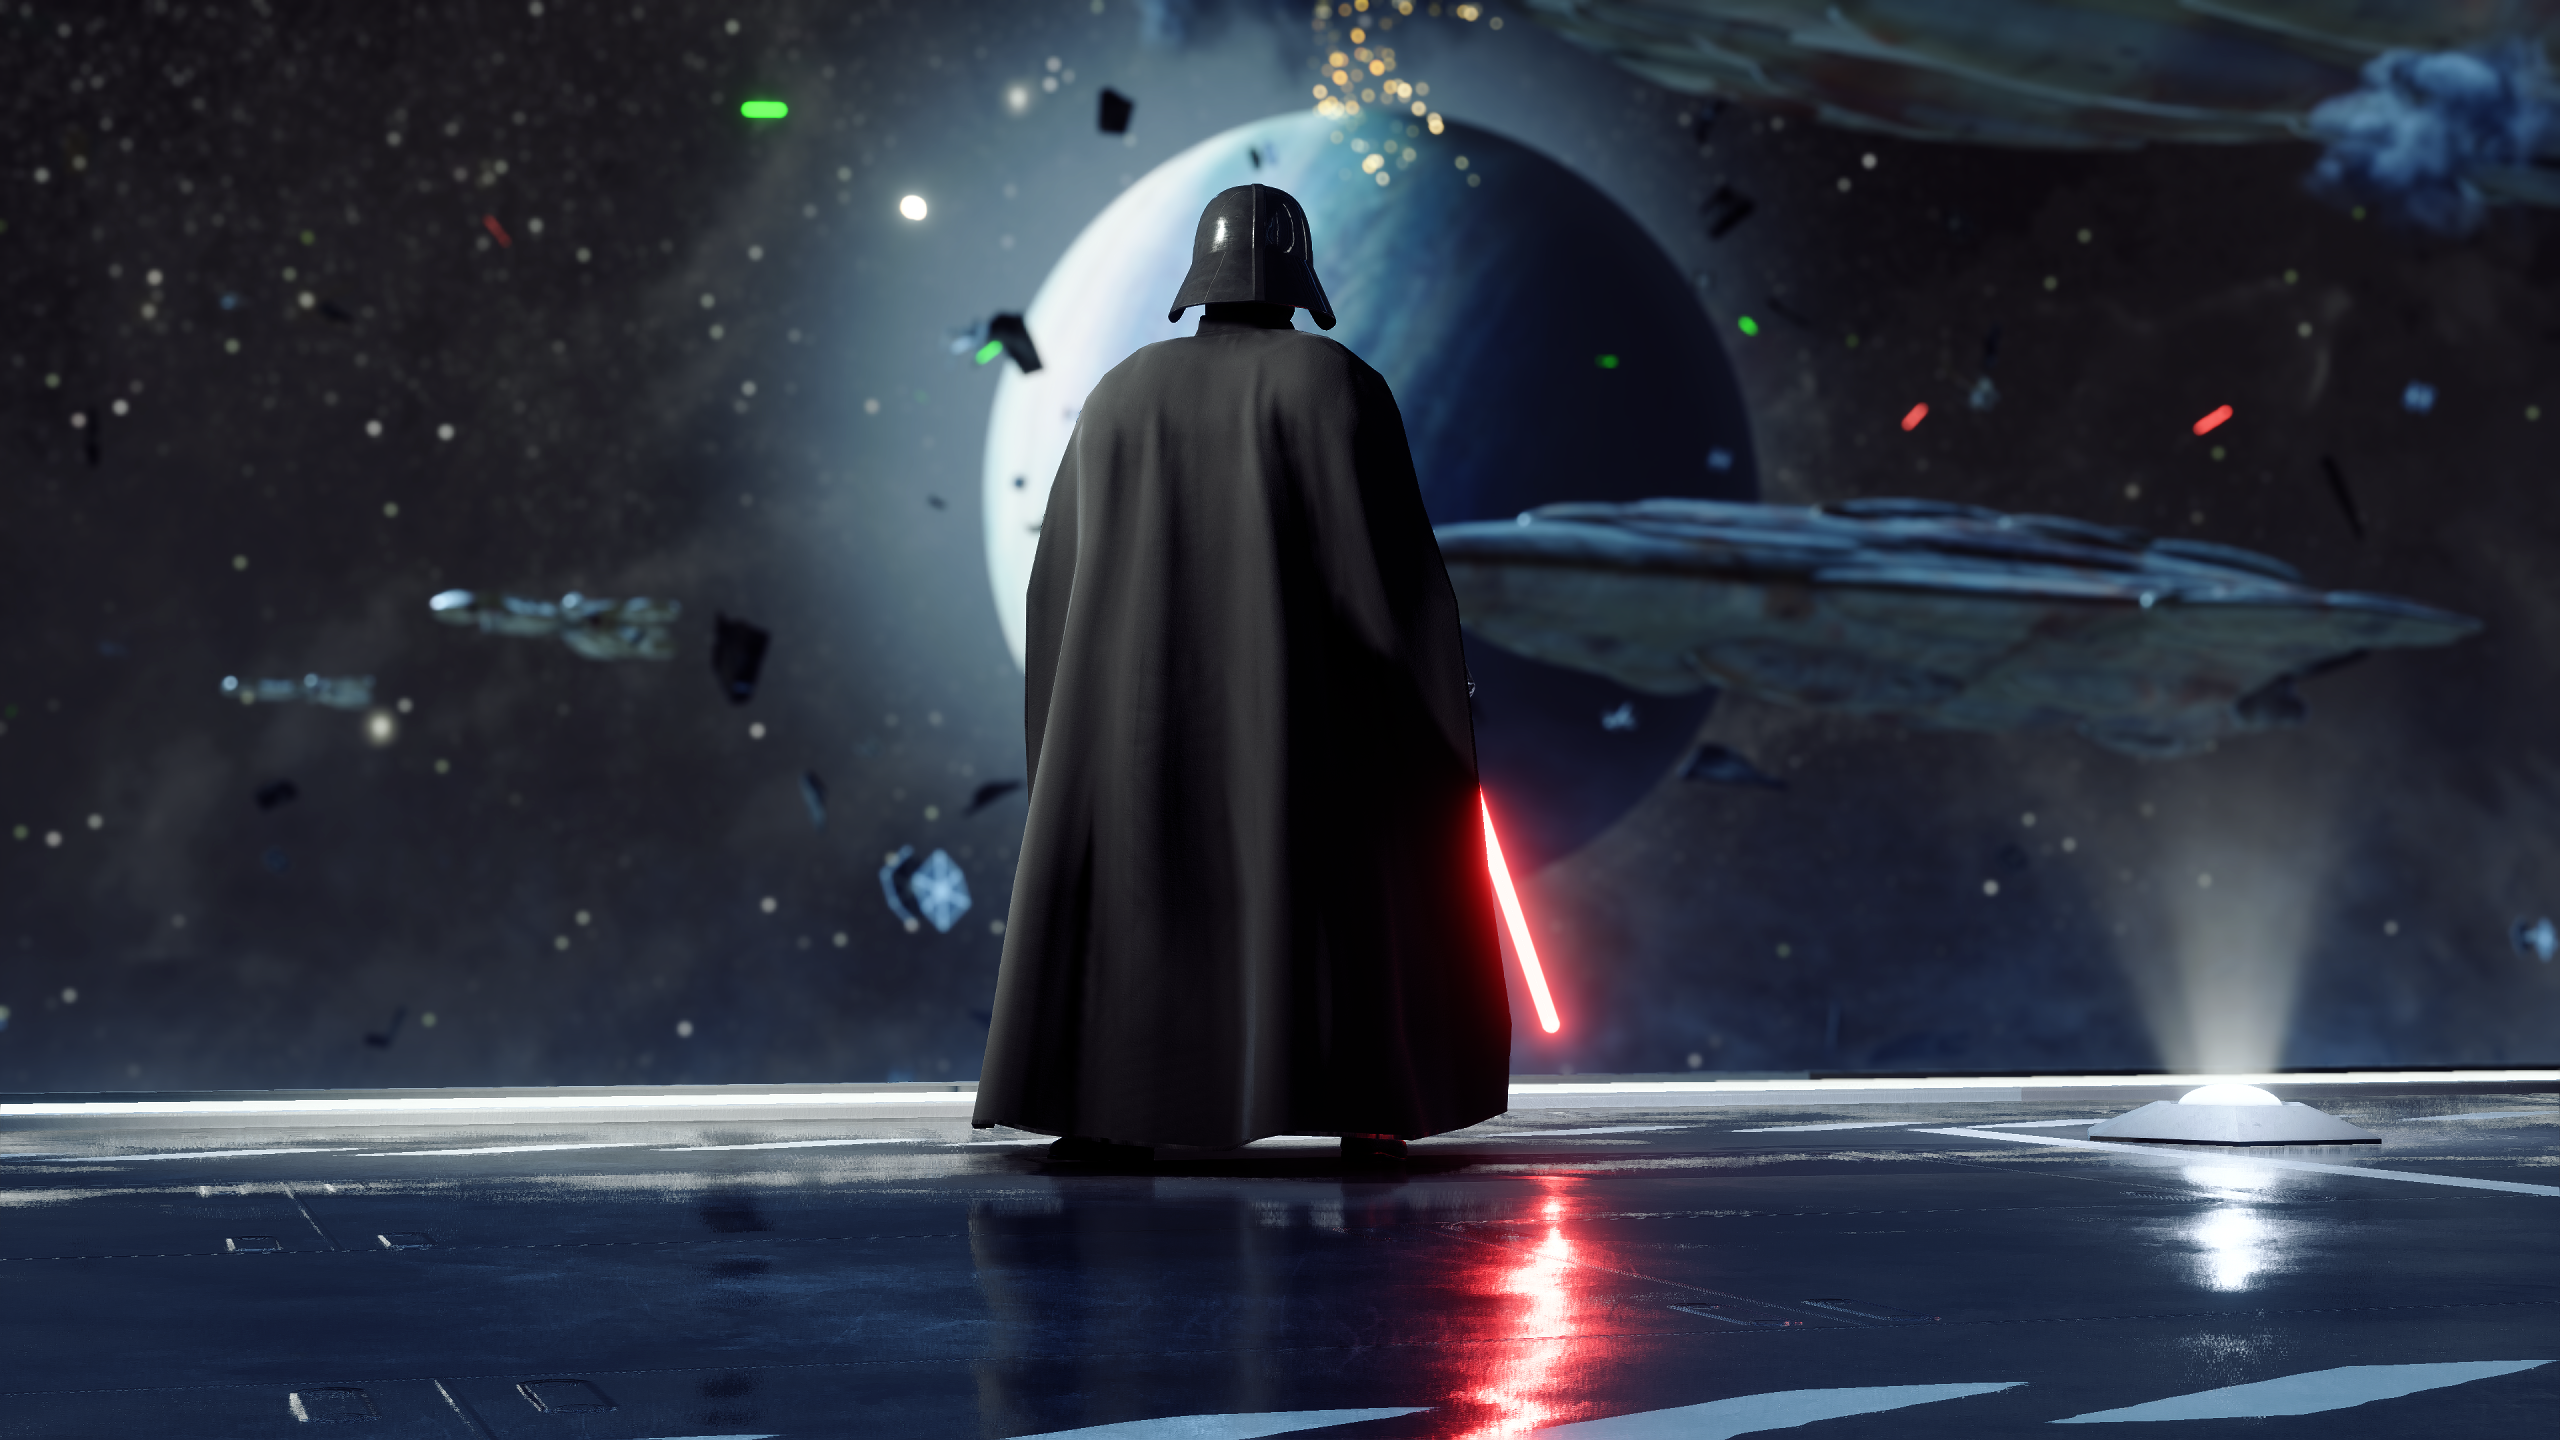 55 Cool Darth Vader Wallpapers On Wallpapersafari